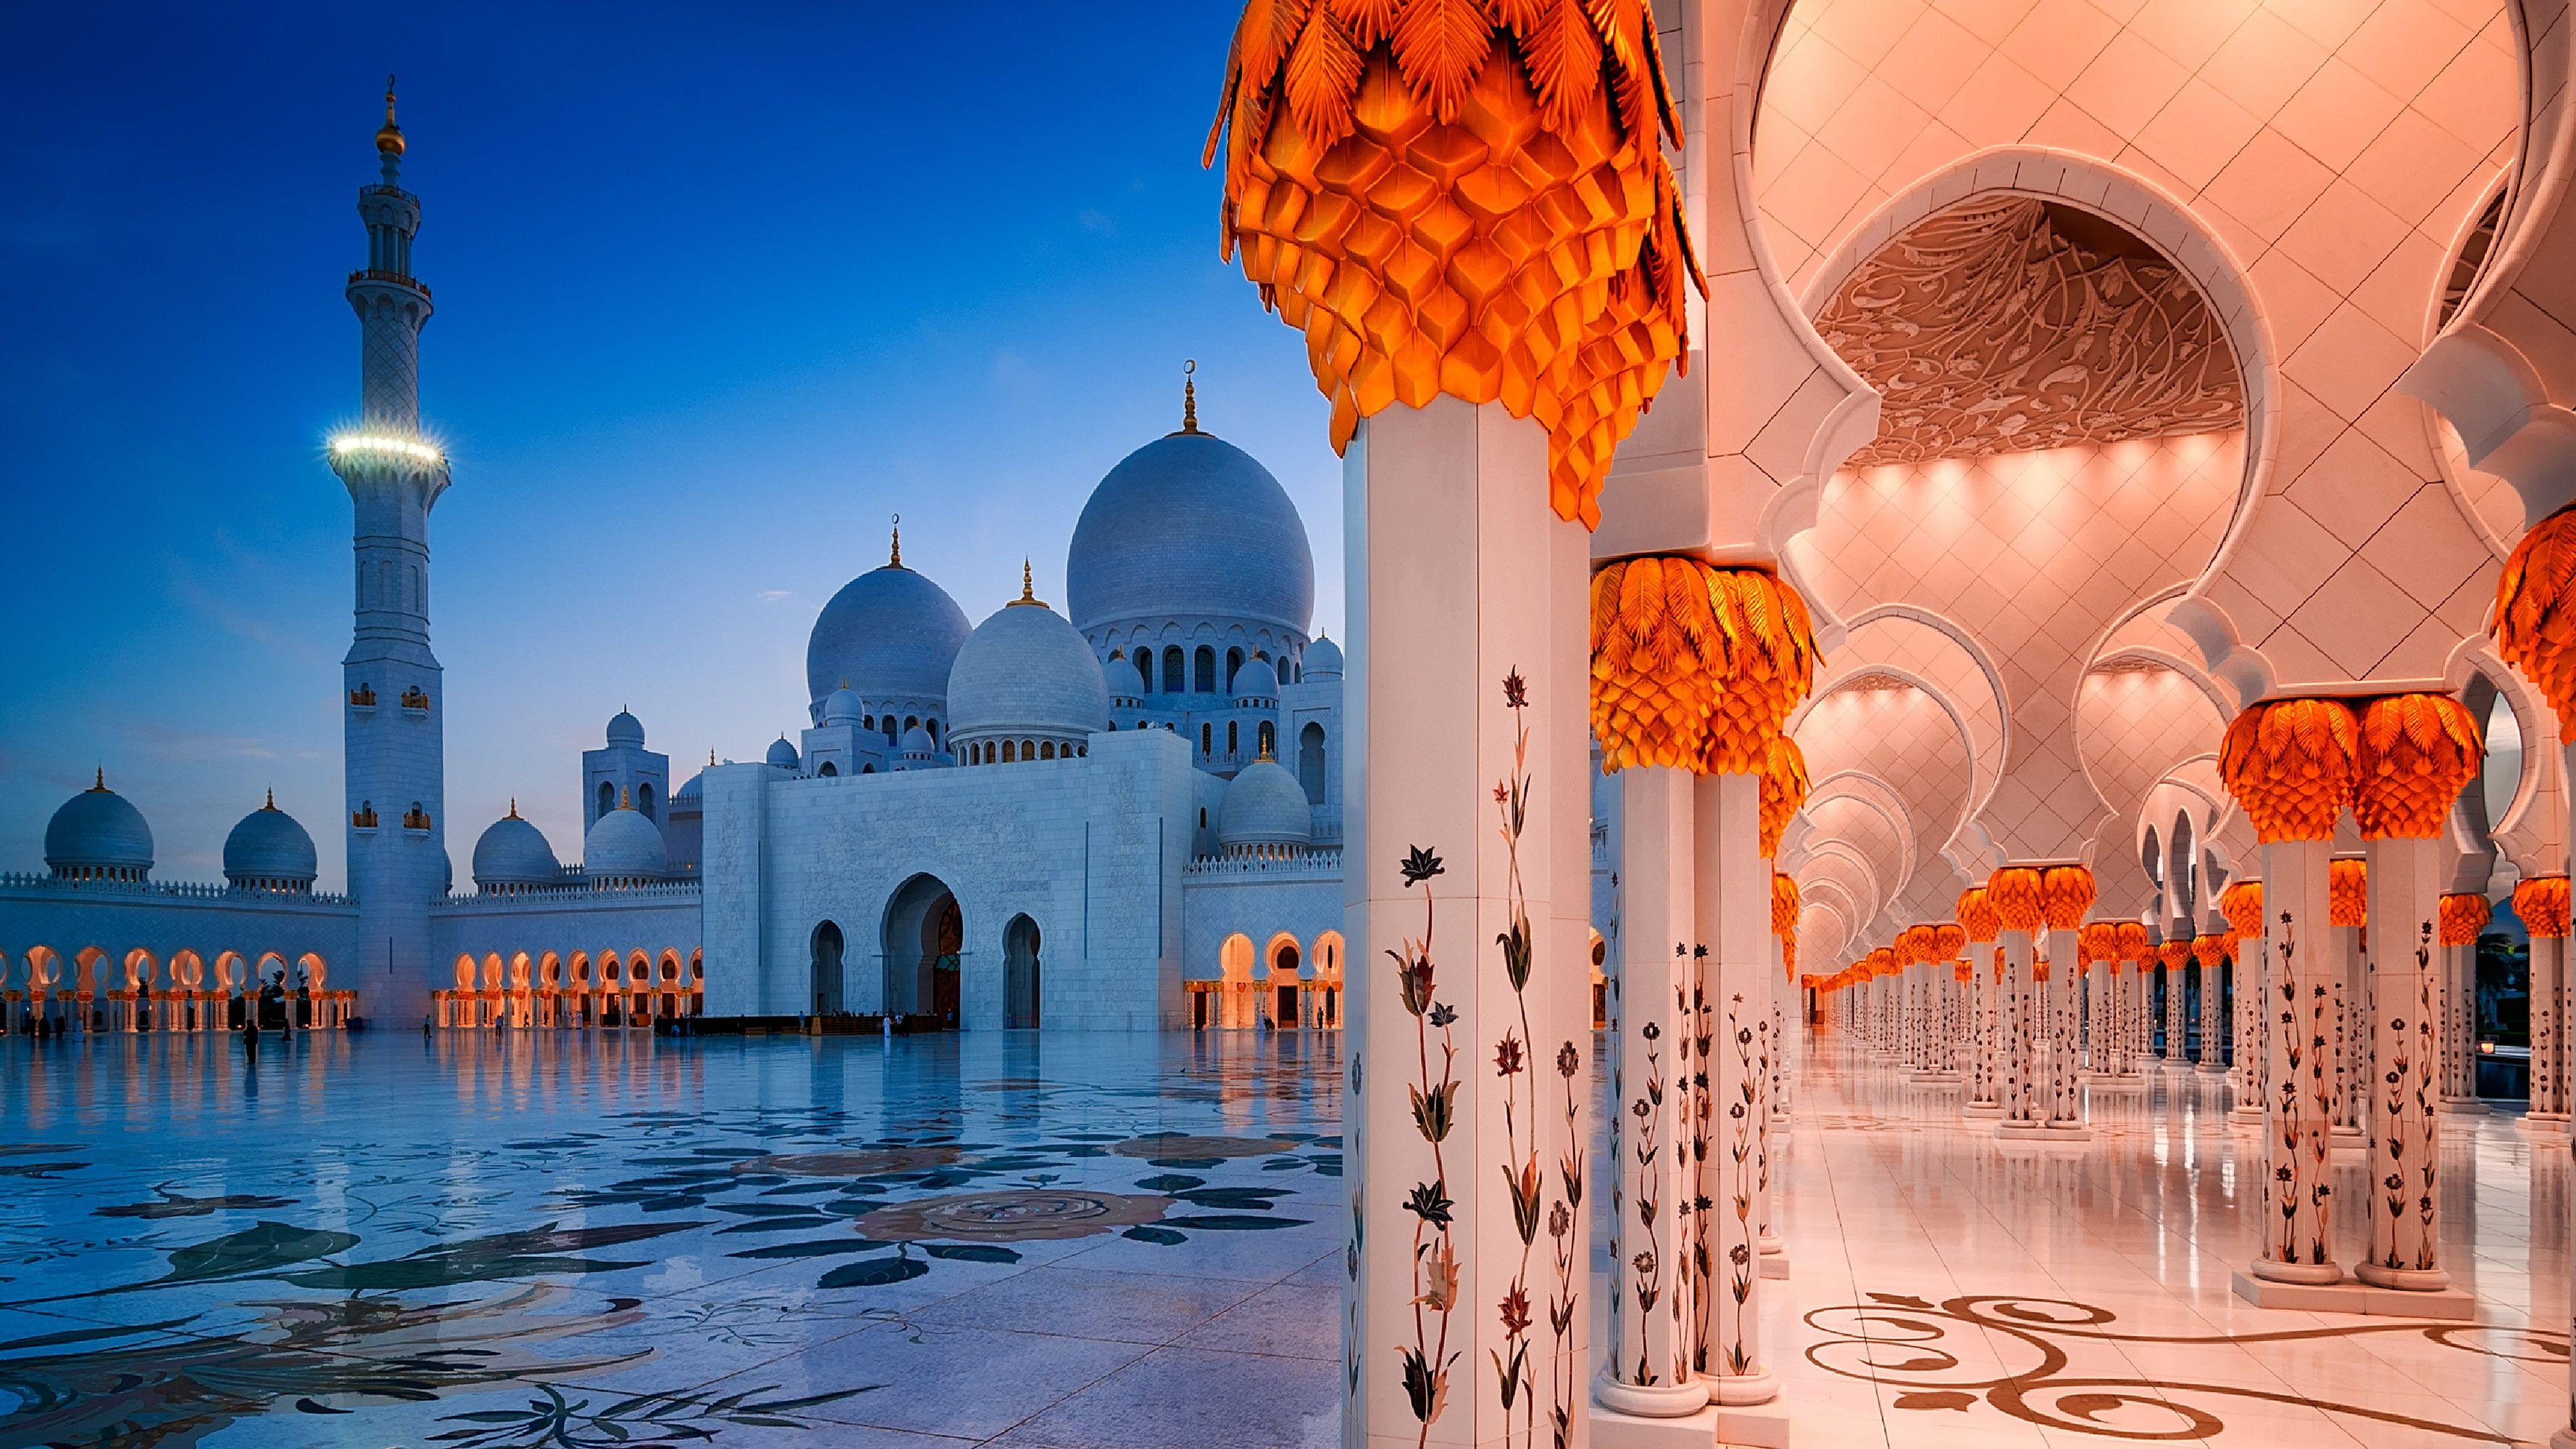 Abu Dhabi Small Group City Tour from Dubai